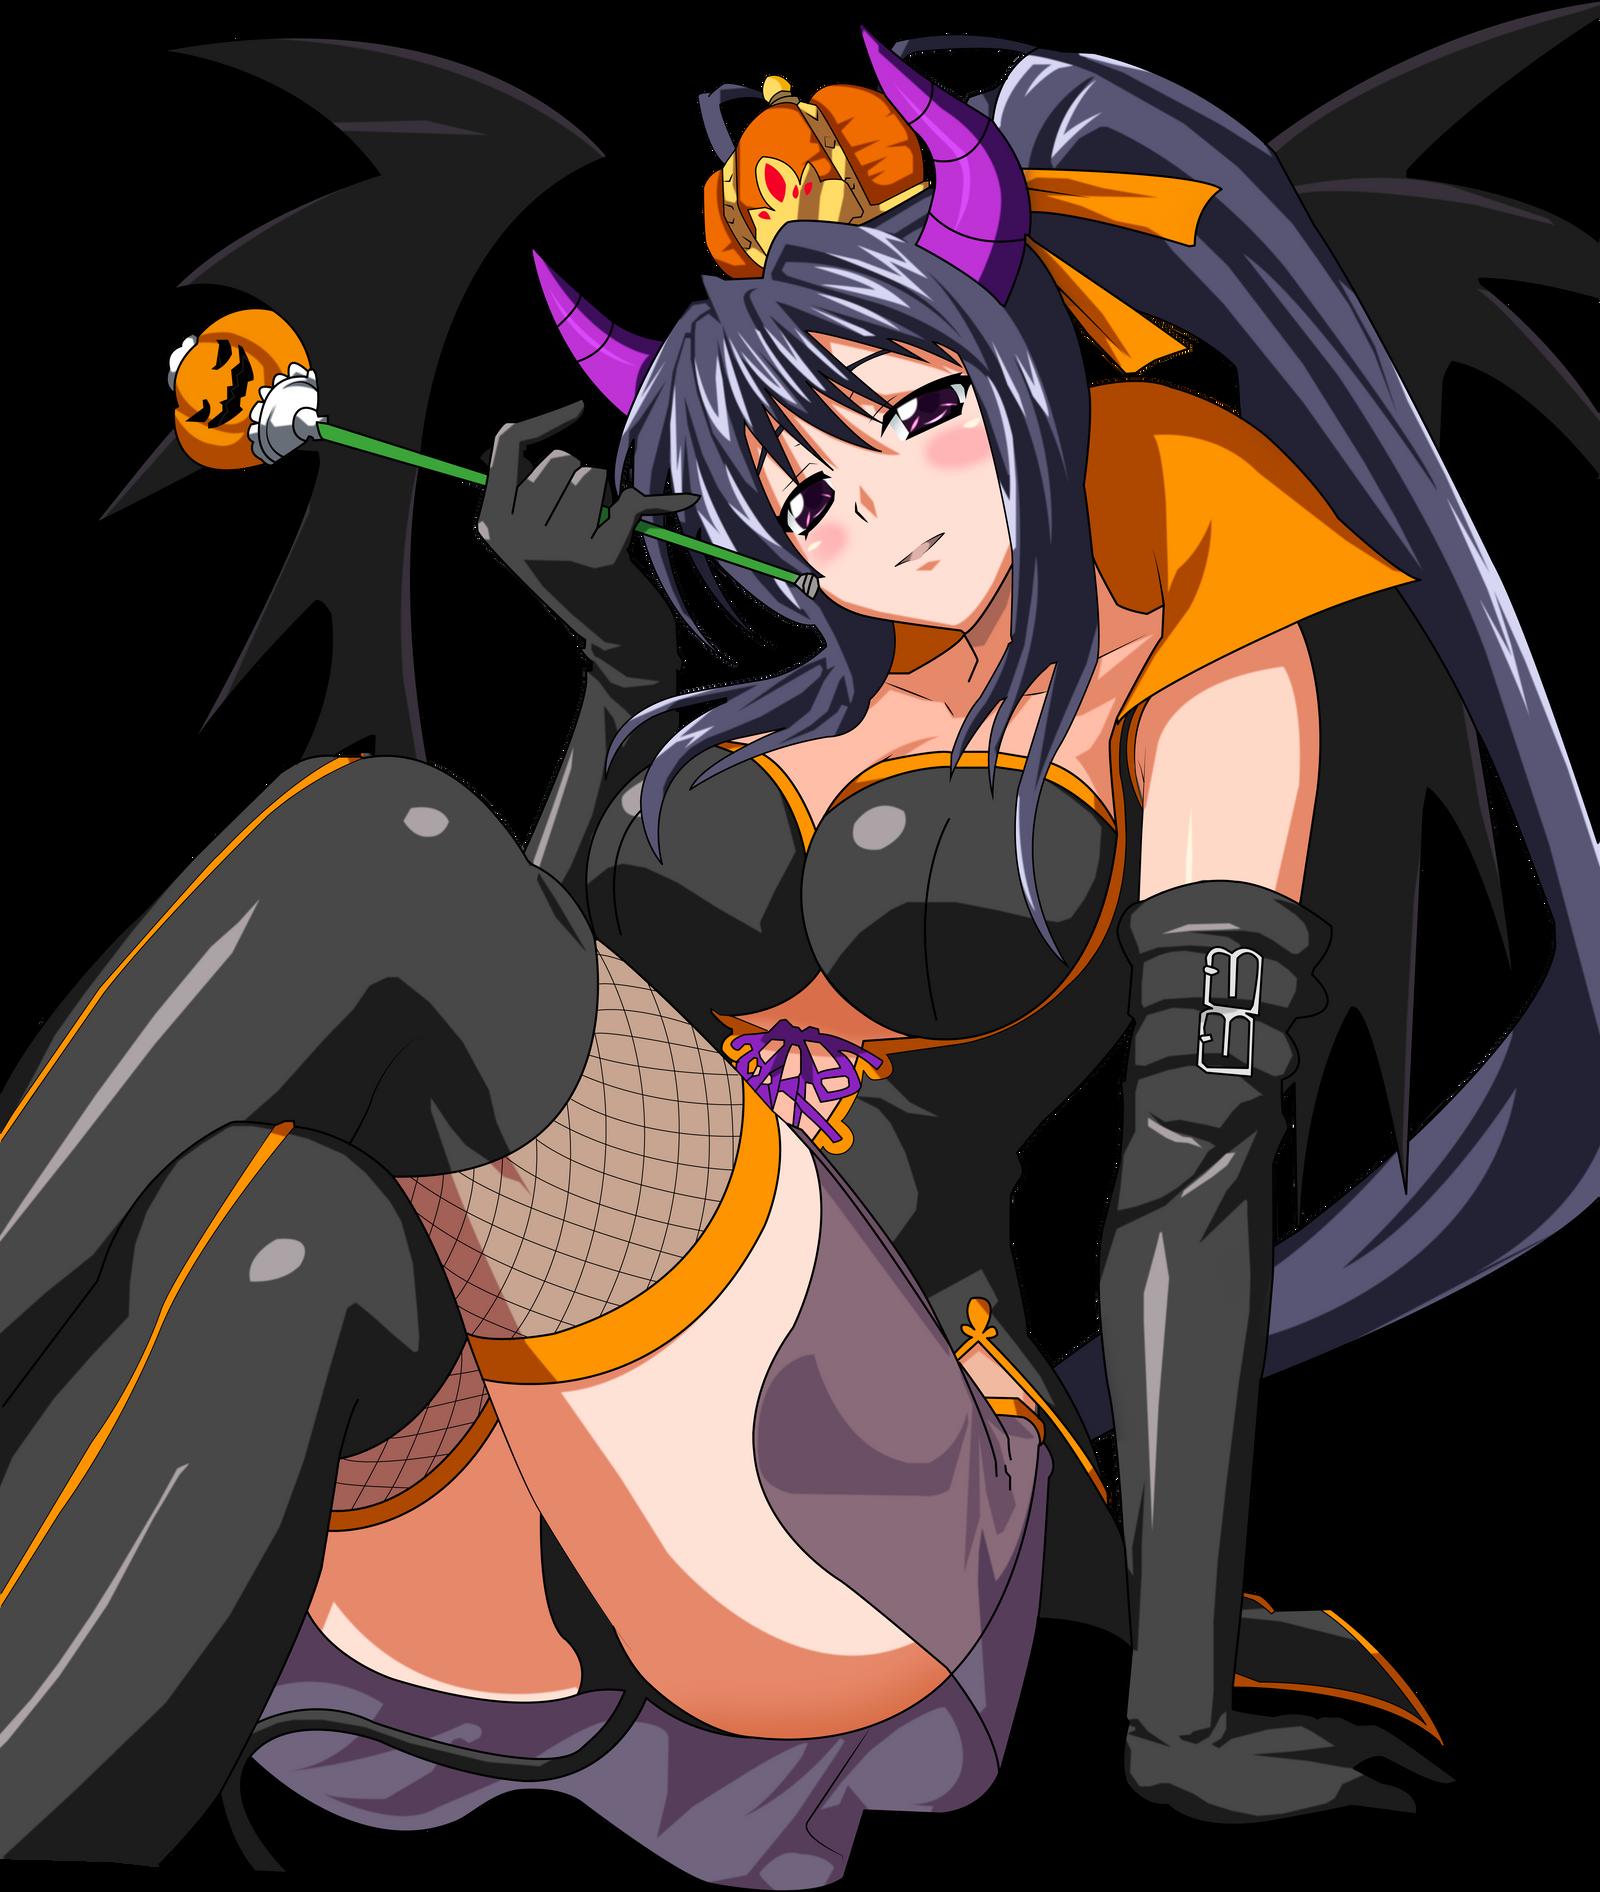 Akeno Halloween Devil Queen Color by Elpida-Wood on DeviantArt